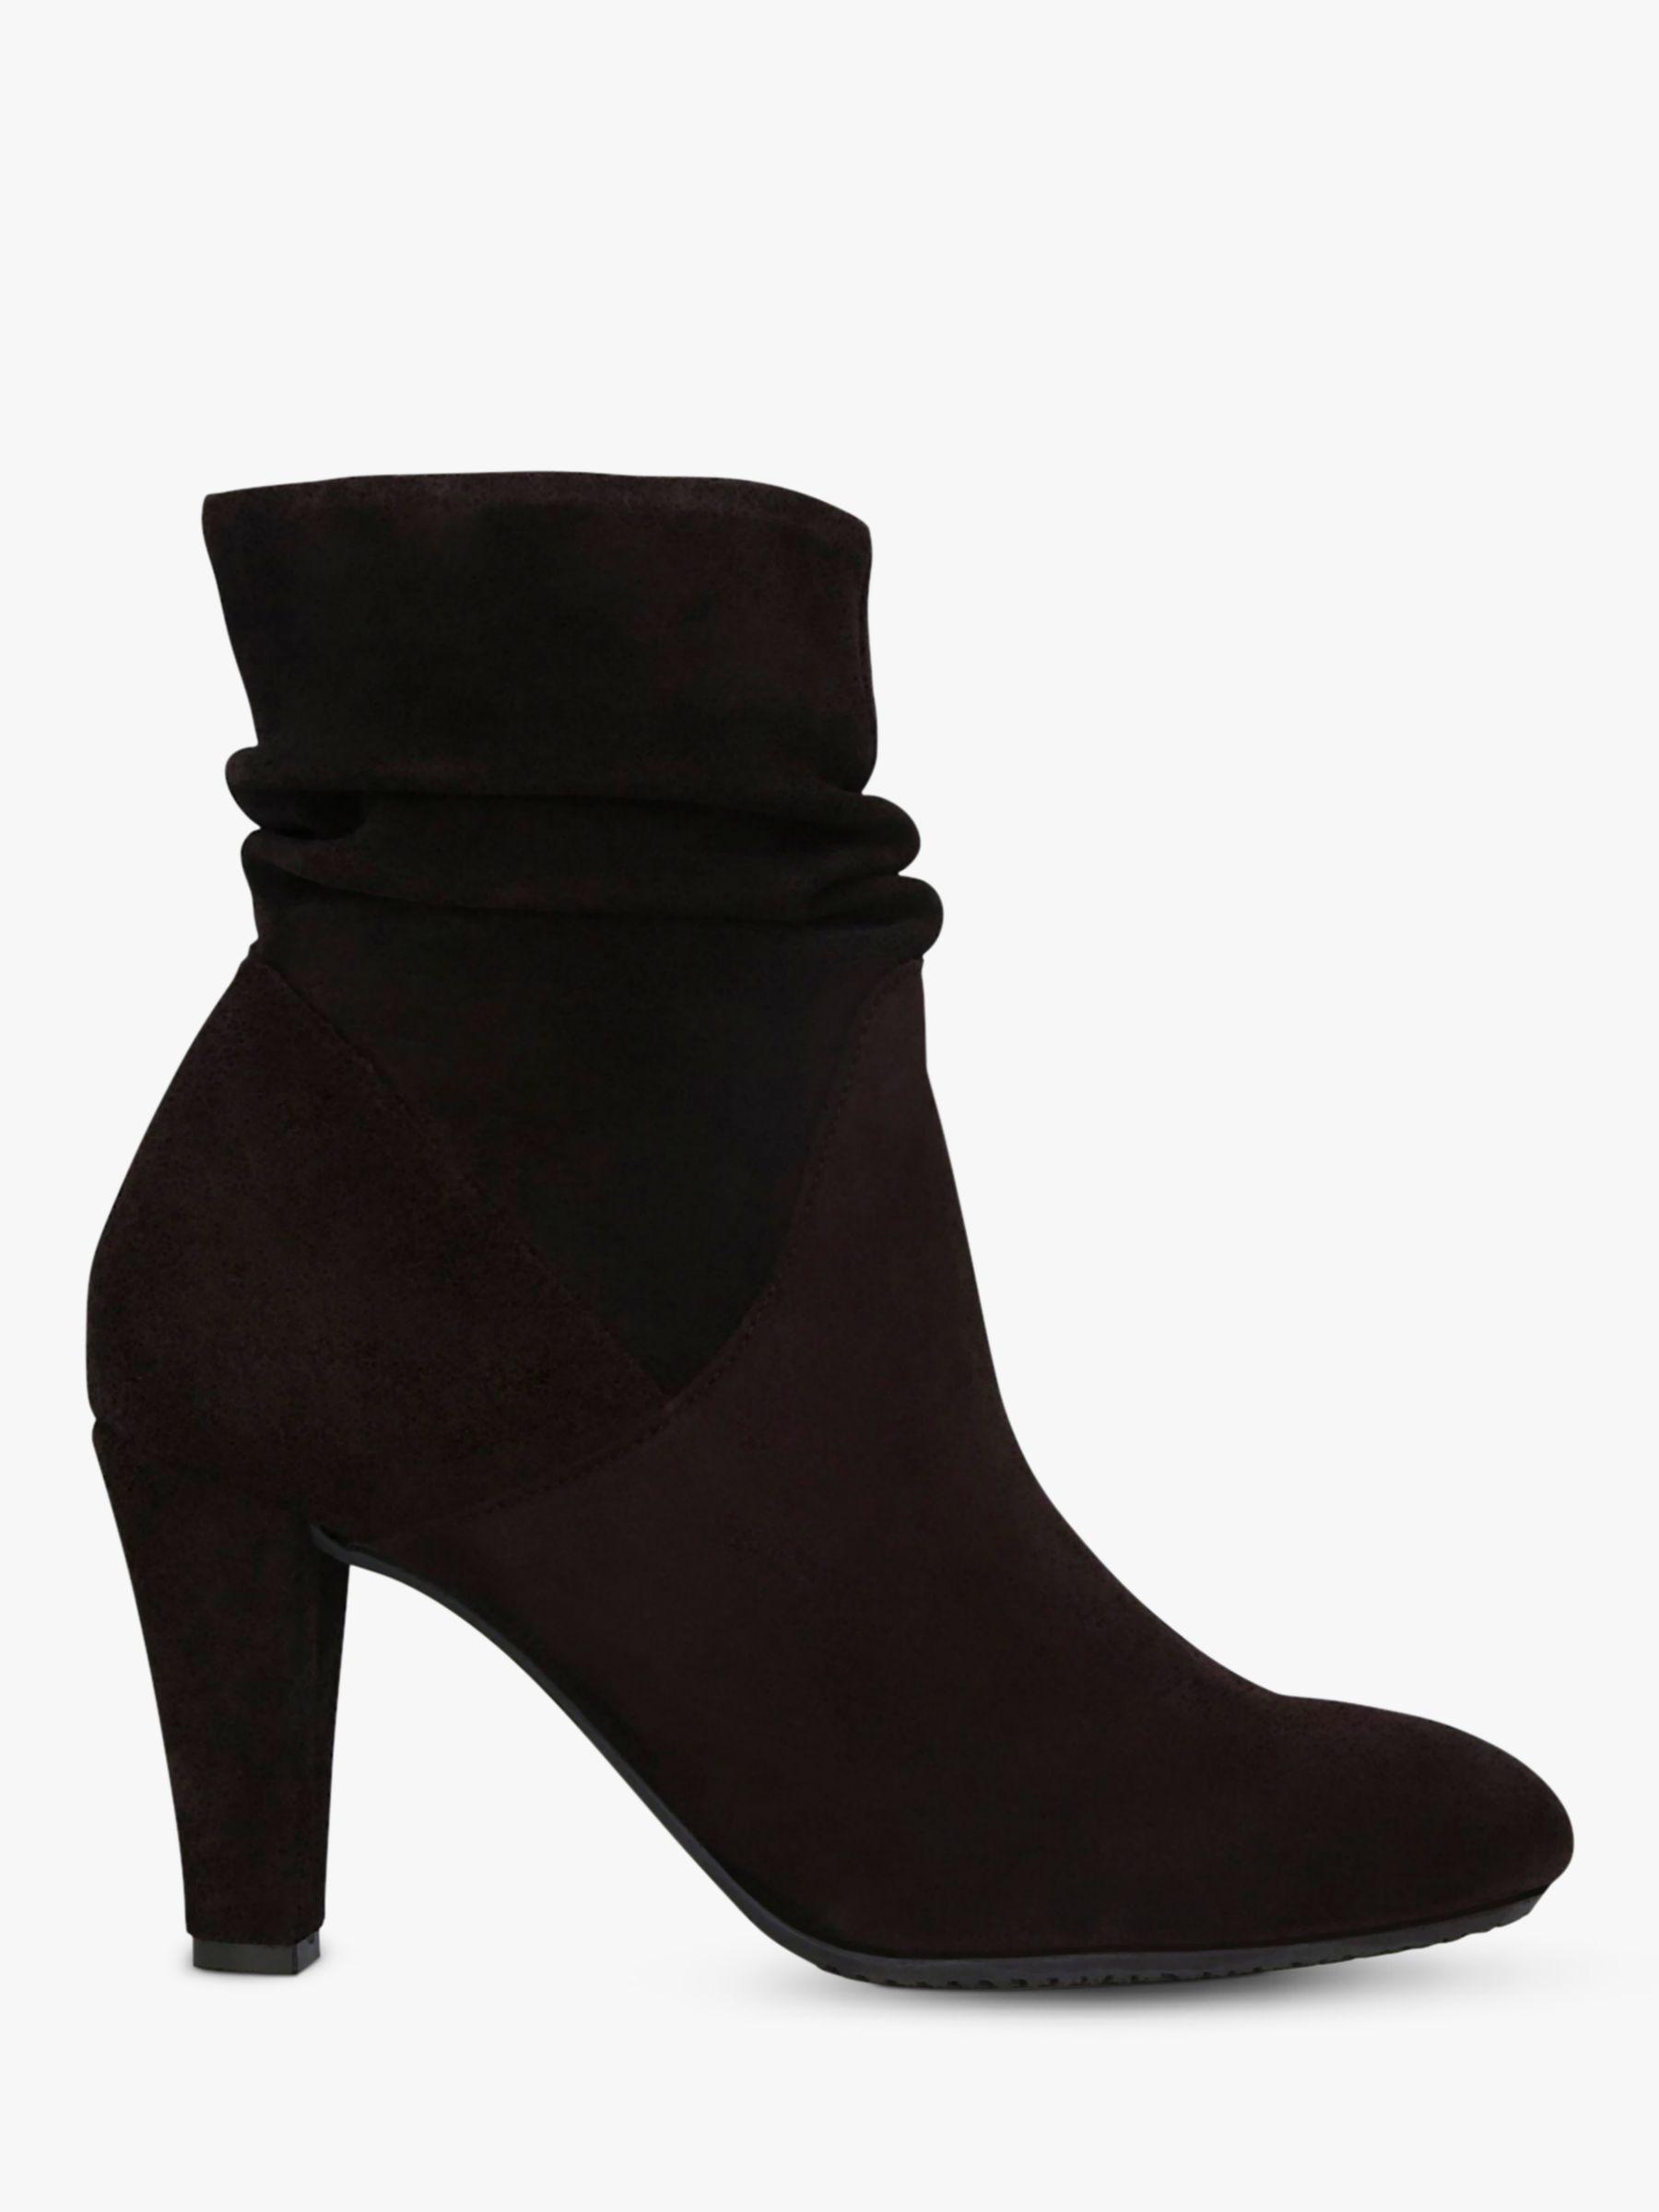 Carvela Comfort Carvela Comfort Rita Suede Slouch Ankle Boots